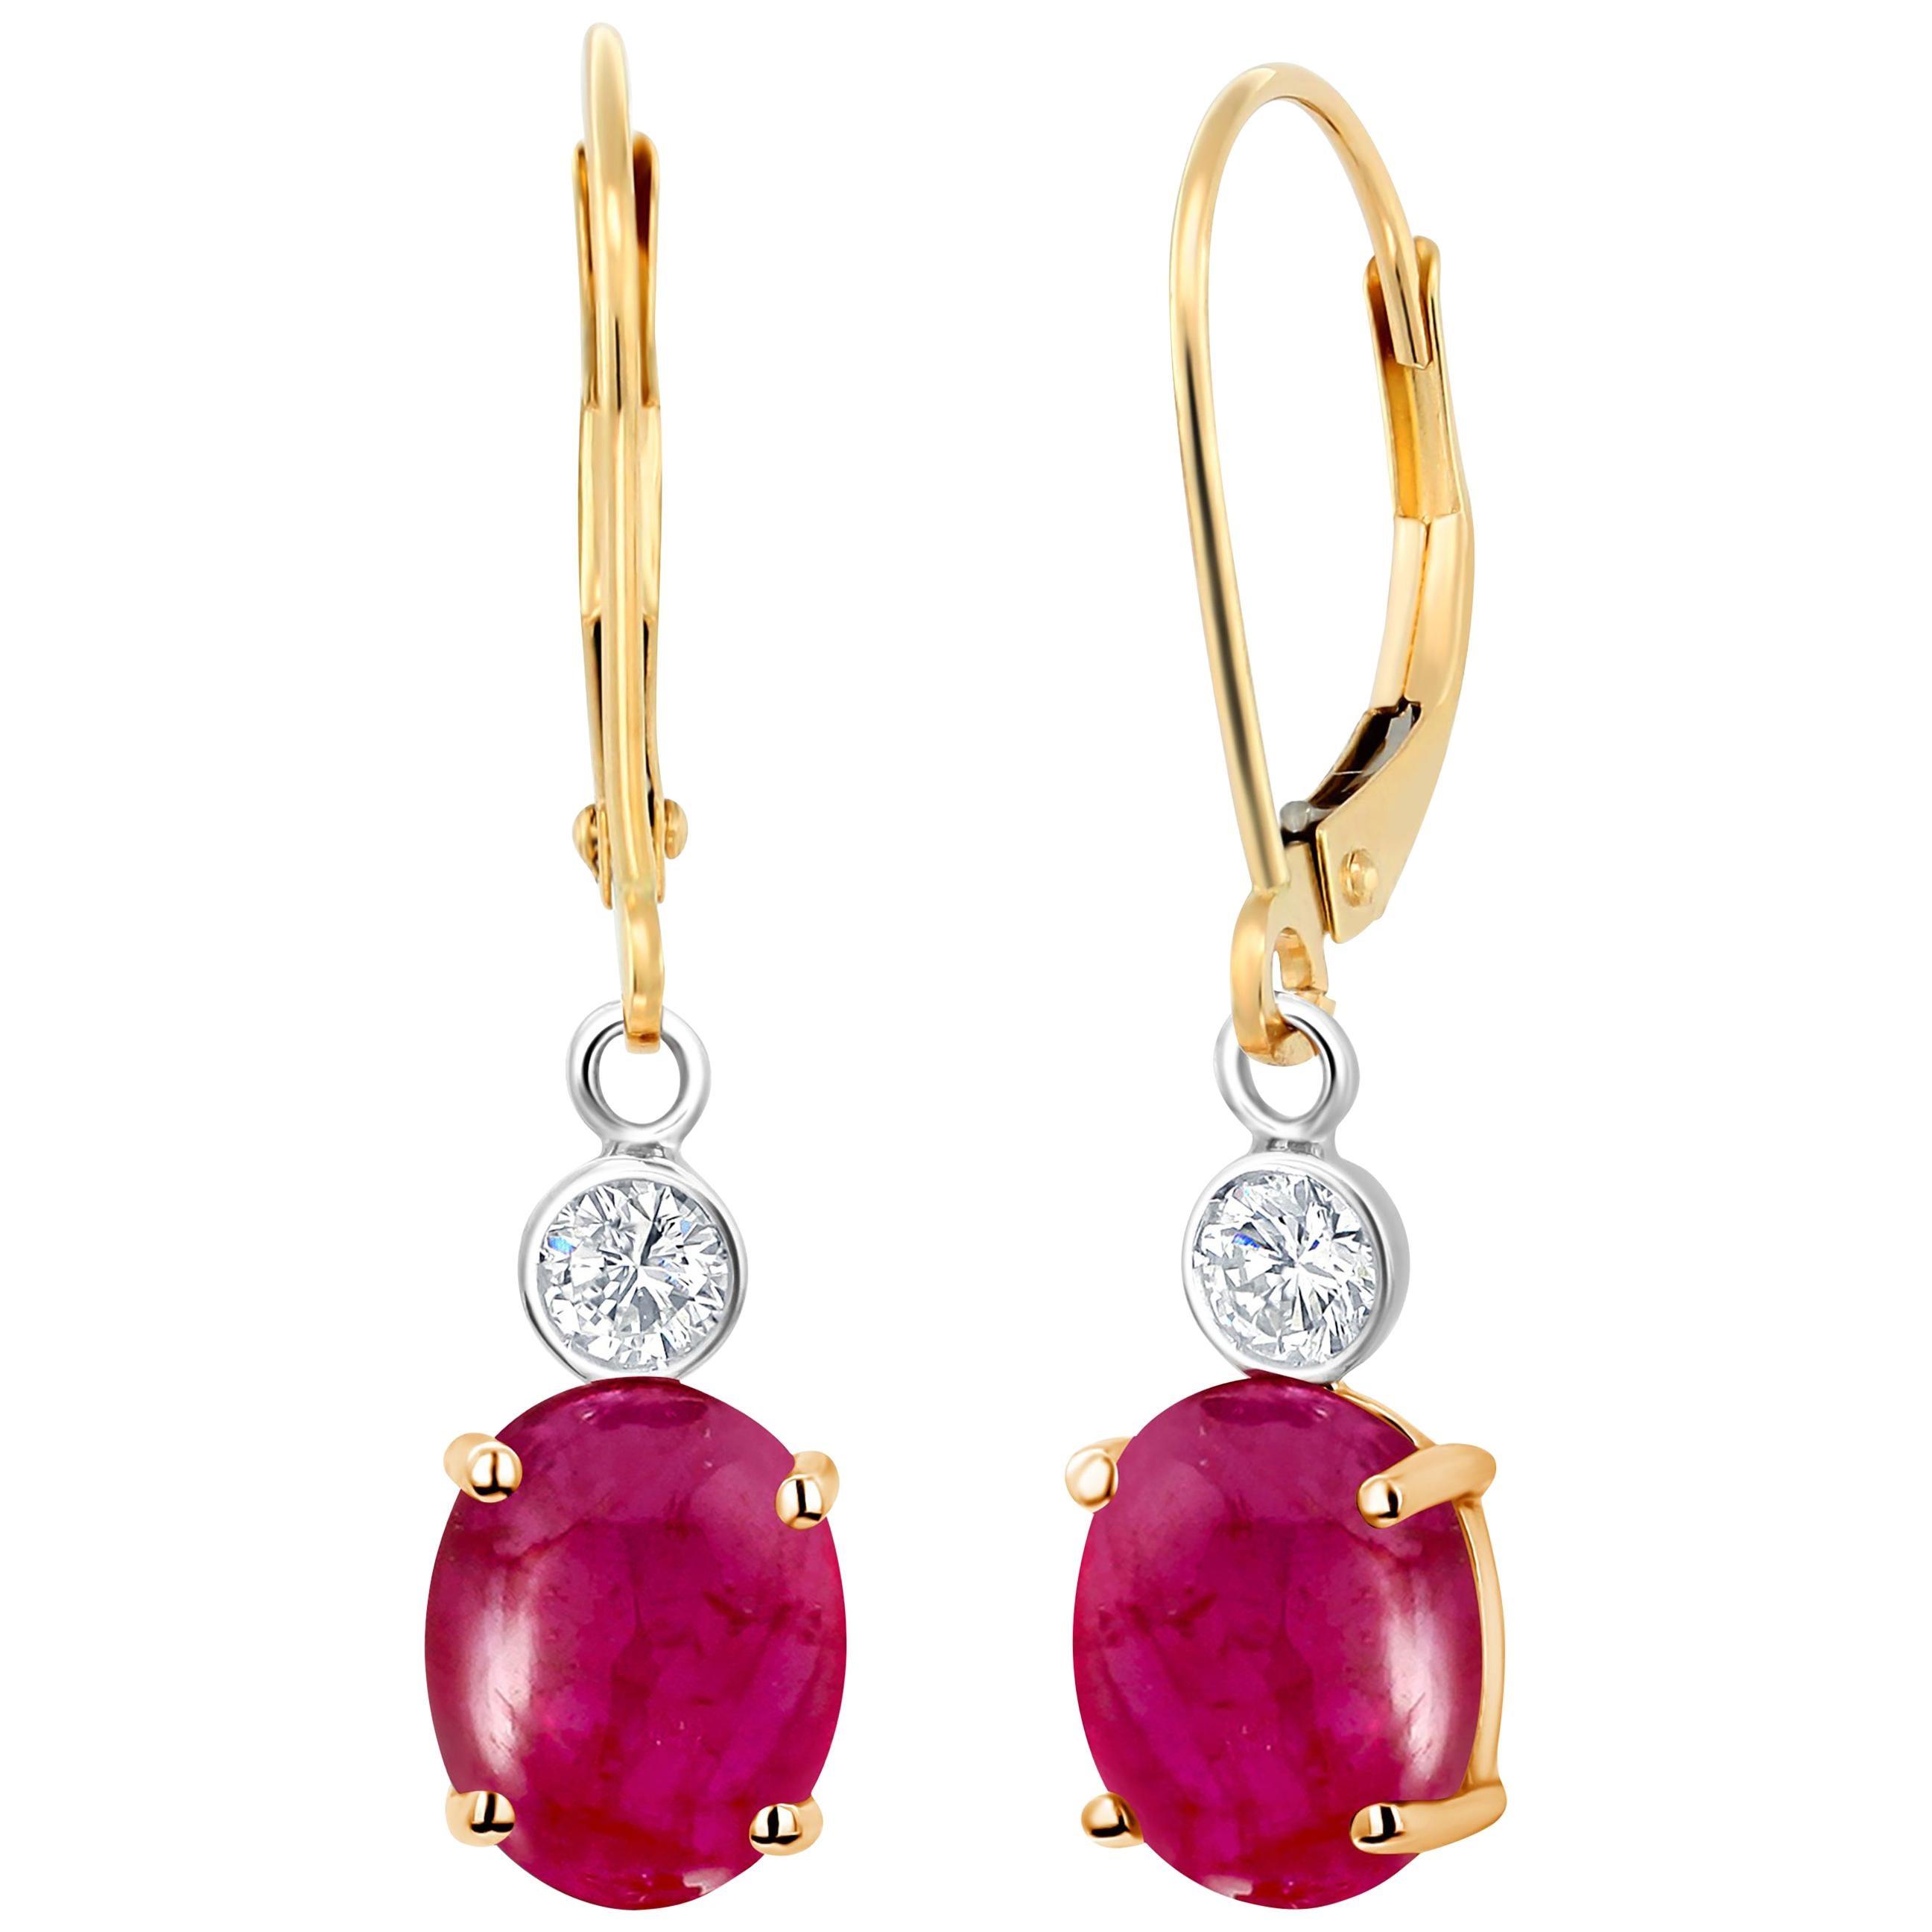 Cabochon Ruby Diamond Gold Hoop Earrings Weighing 3.75 Carat